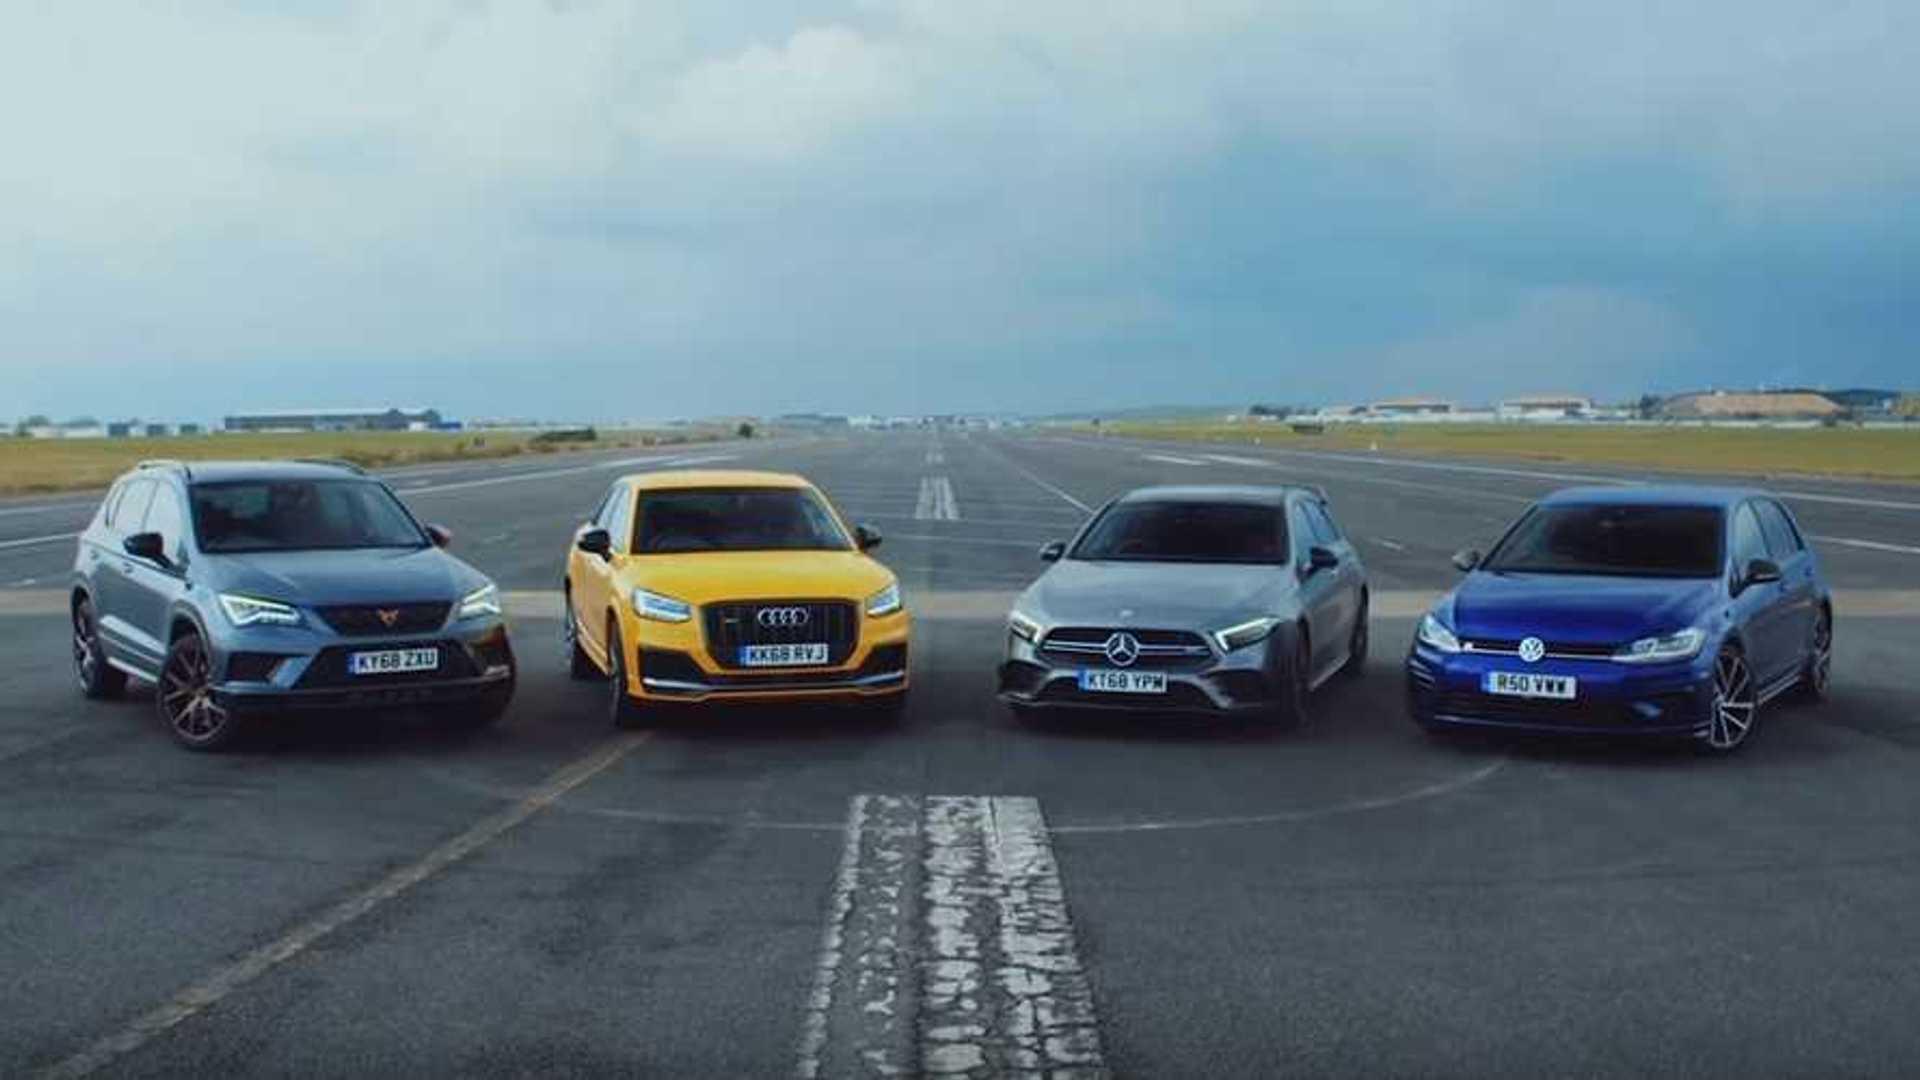 Top Gear Pits Golf R Against, AMG A35, SQ2, Cupra Ateca In Drag Race